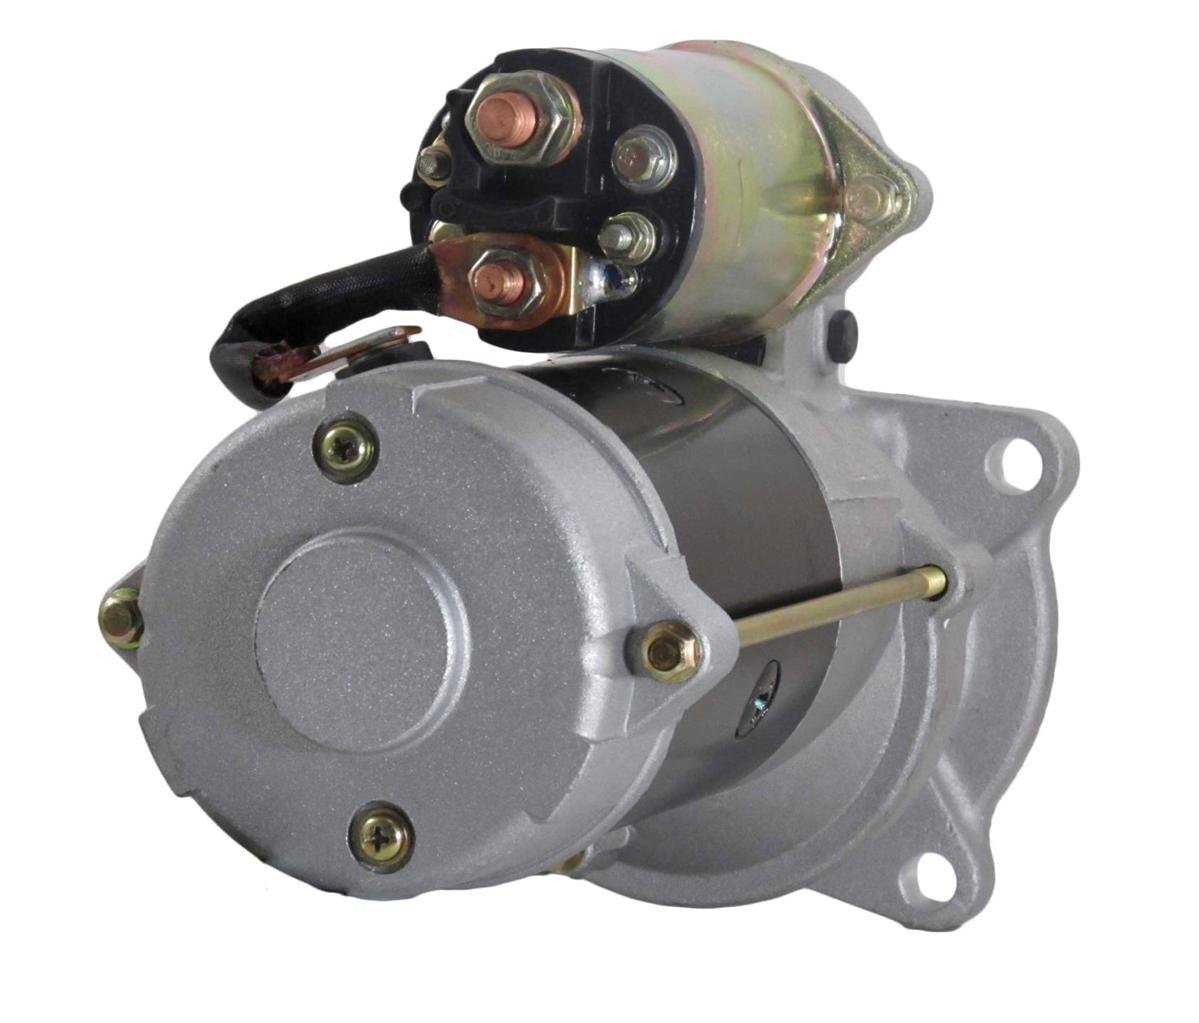 Amazon.com: NEW 12V 9T STARTER MOTOR FITS JOHN DEERE TRACTOR 3020 4000 4010  4020 1107578 1109145: Automotive